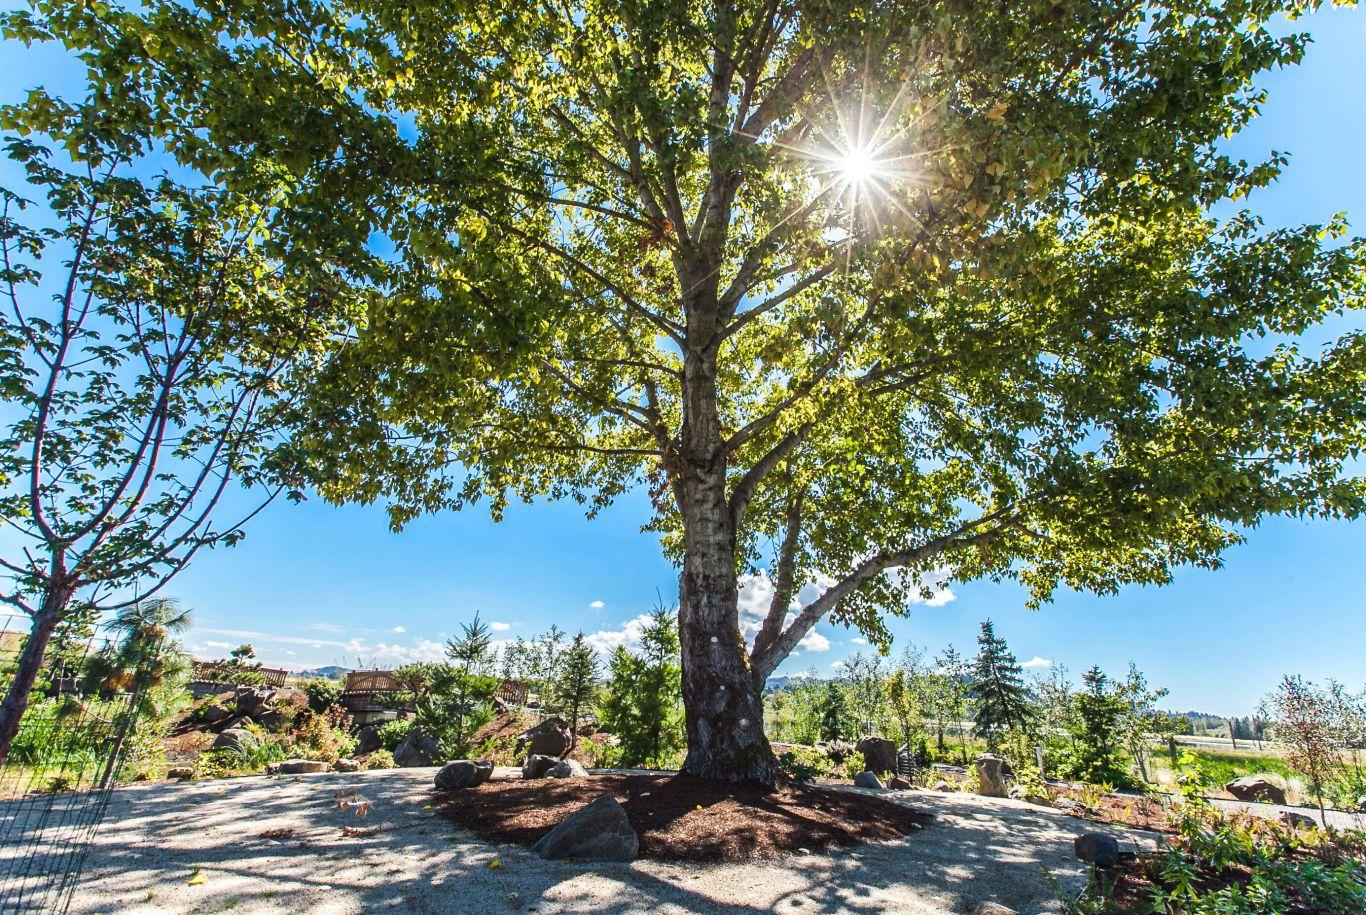 tree with sun shining behind it in Fernhill Wetlands